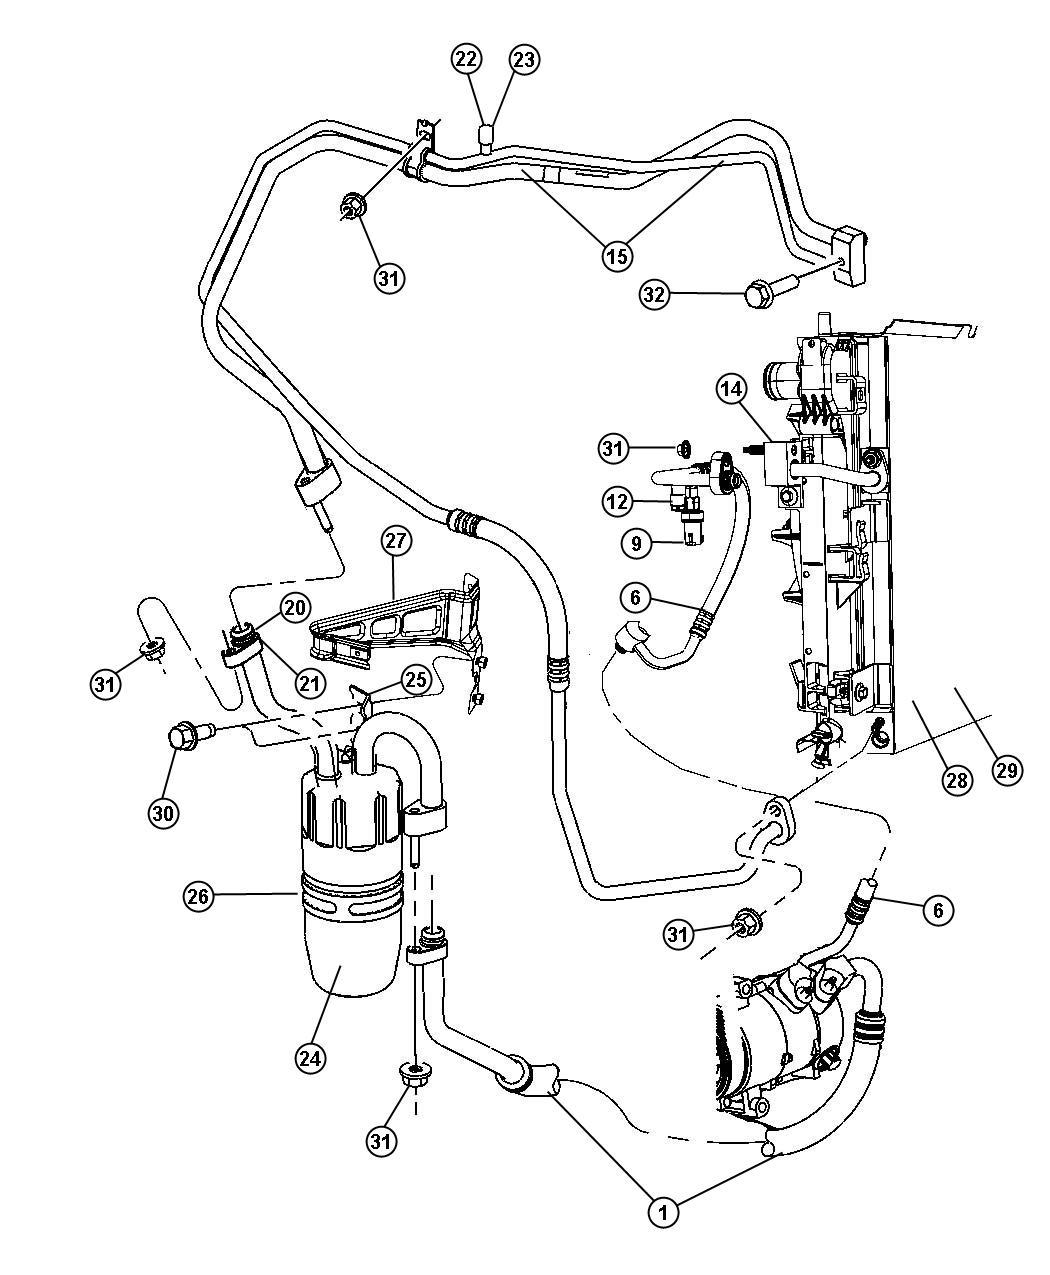 Chrysler Sebring Line A C Discharge Air Plumbing